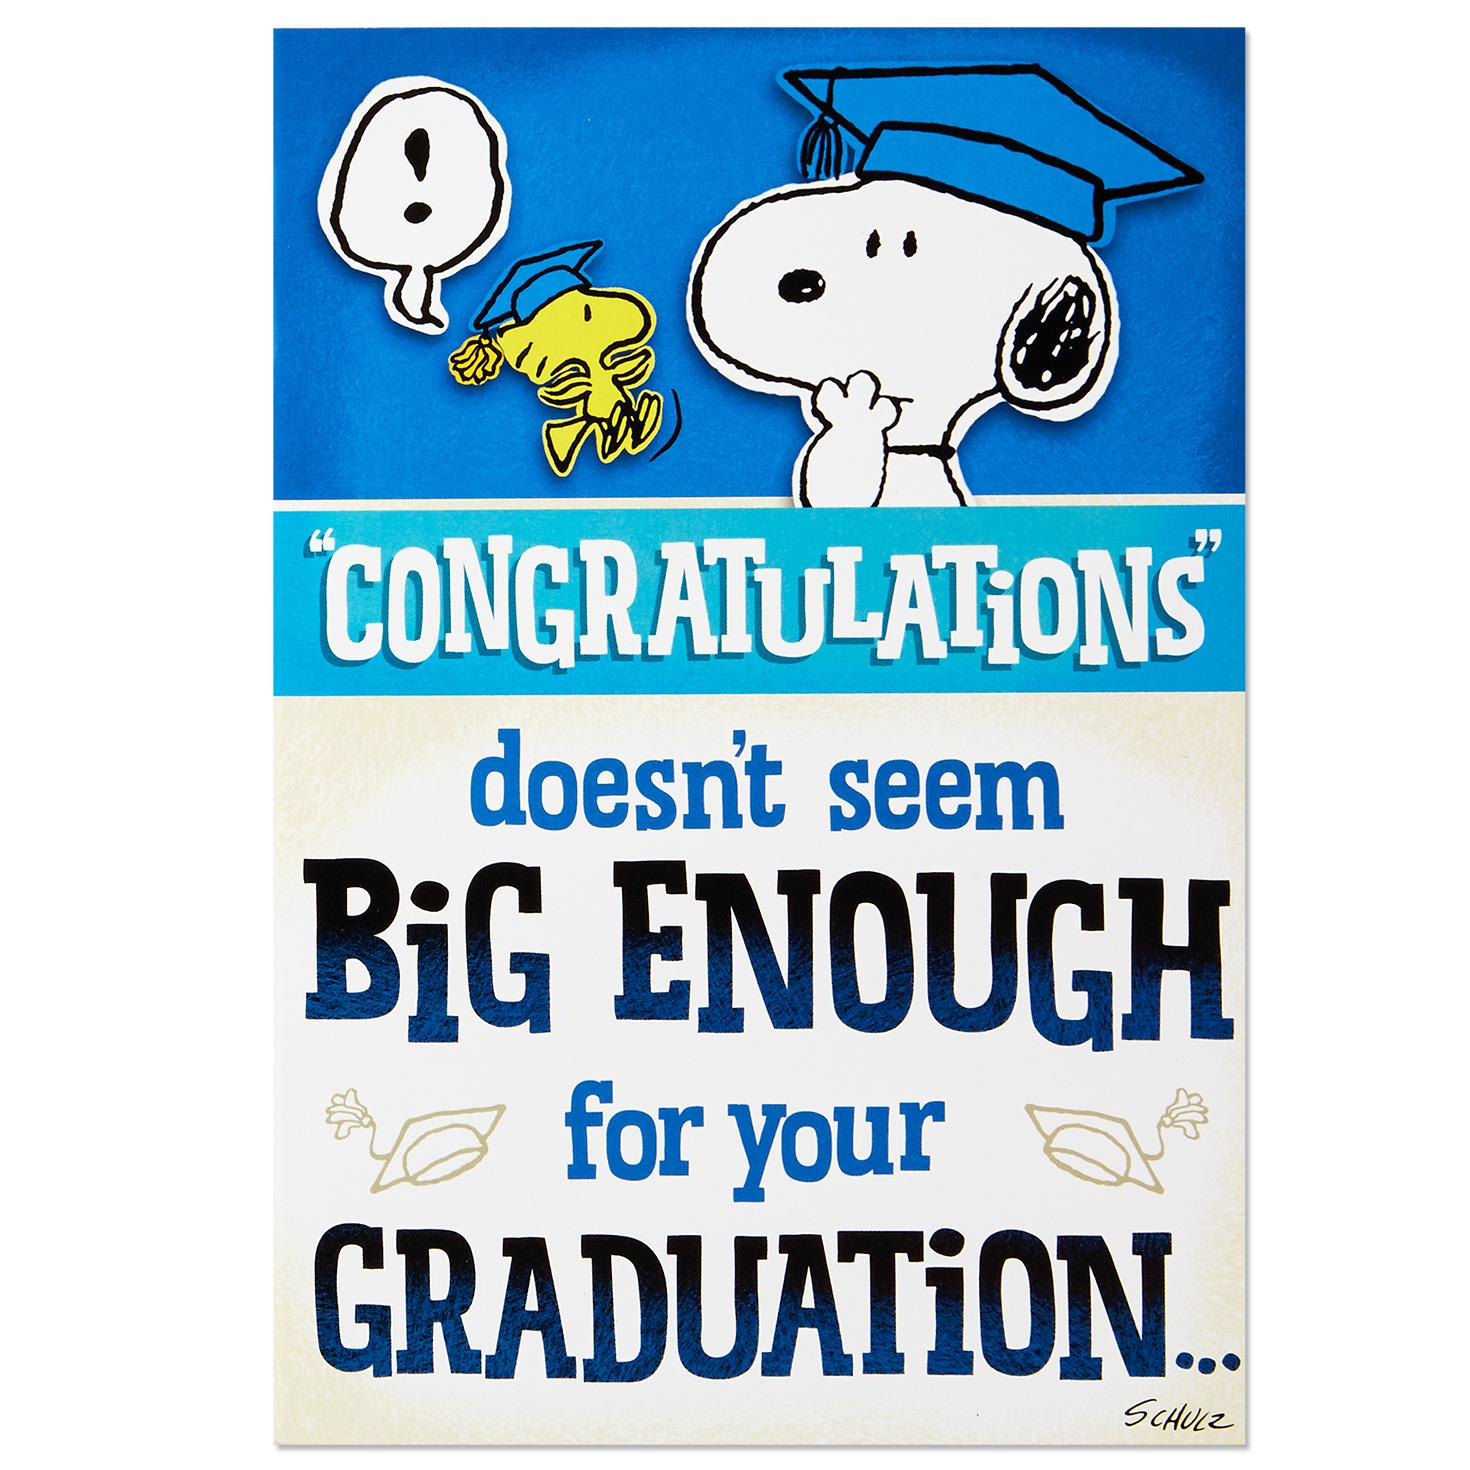 congratulations on your graduation card thevillas co